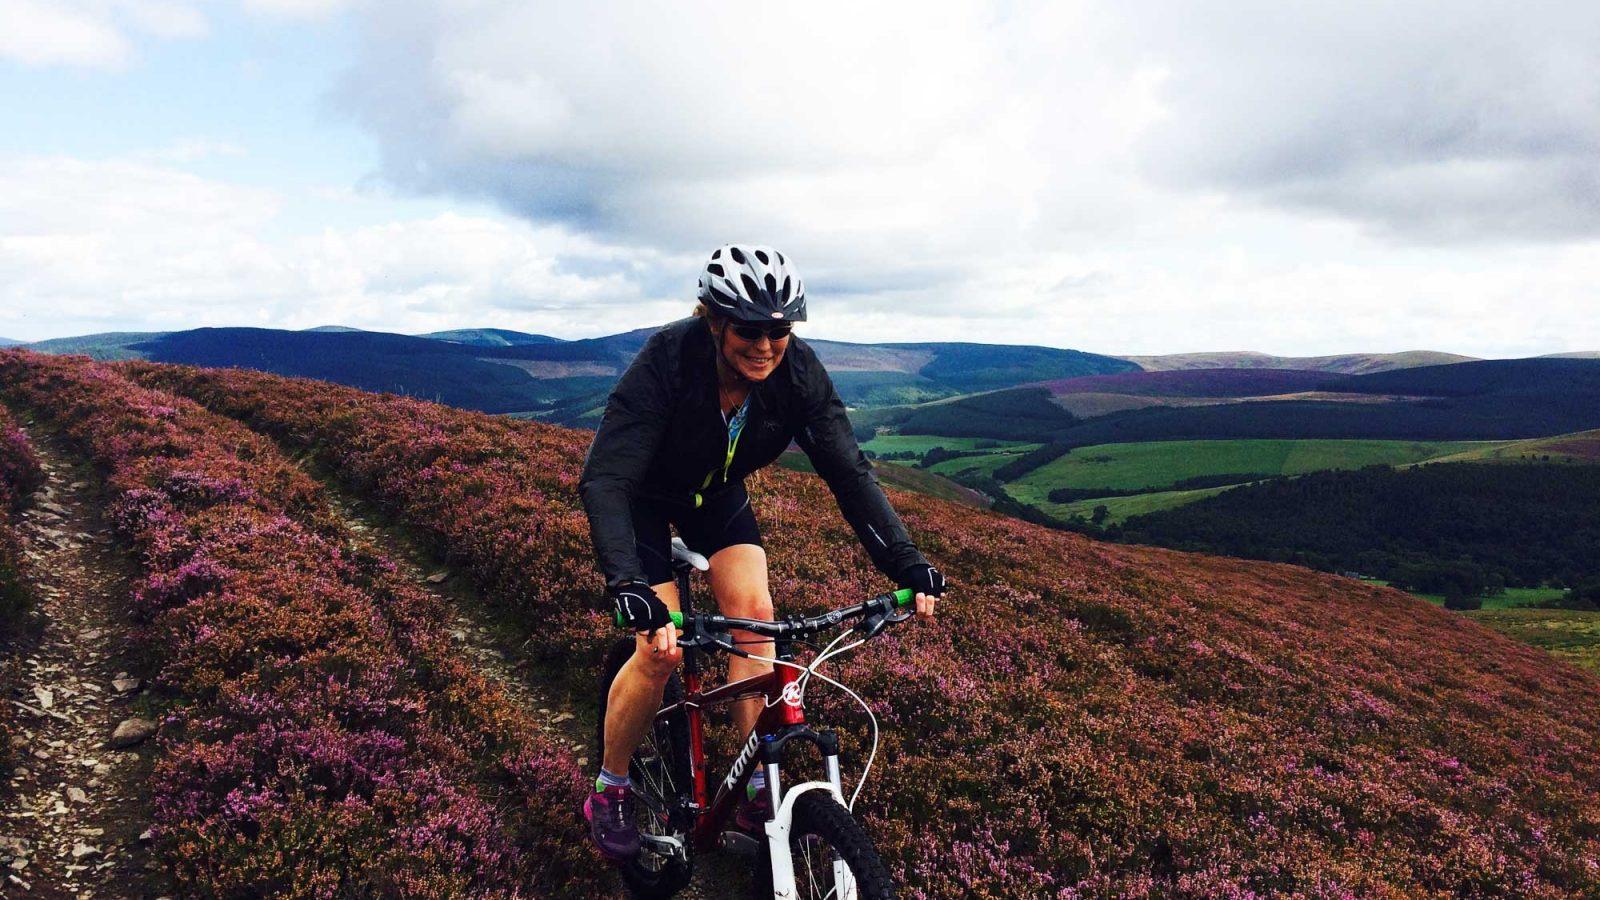 Mountain Biking, The Gypsy Glen